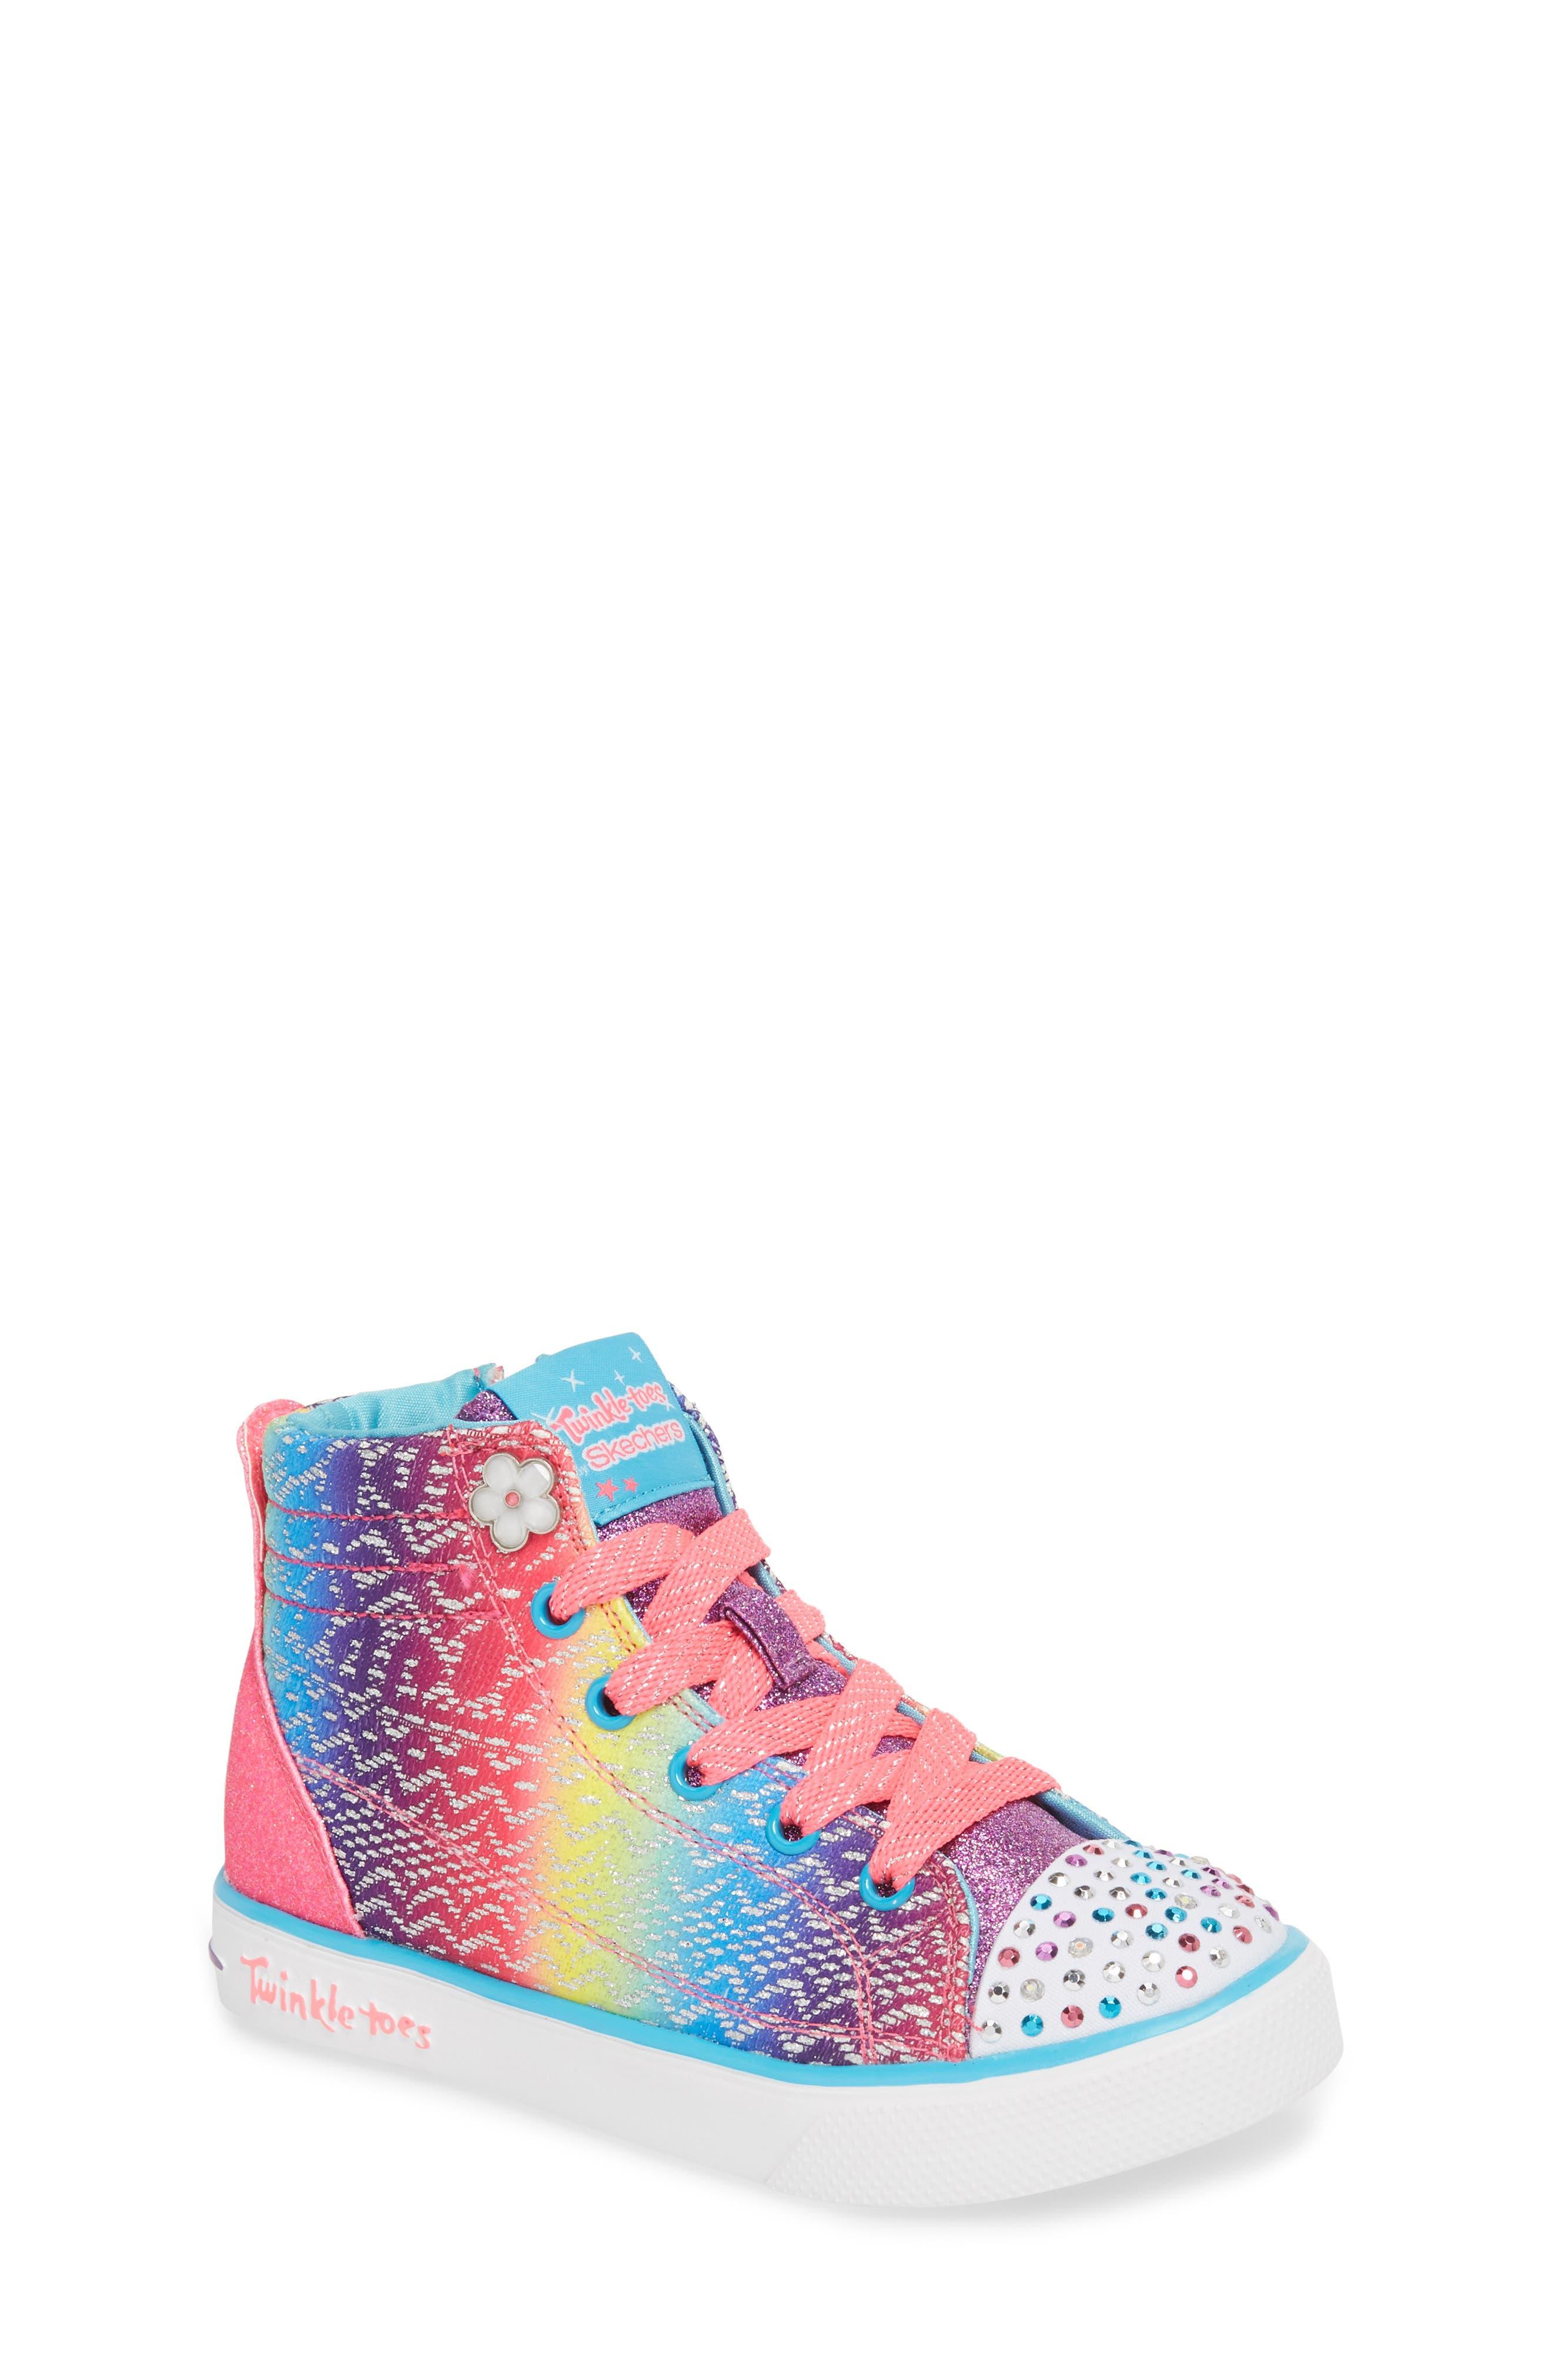 SKECHERS Twinkle Toes Breeze 2.0 Light-Up High Top Sneaker (Toddler, Little Kid & Big Kid)